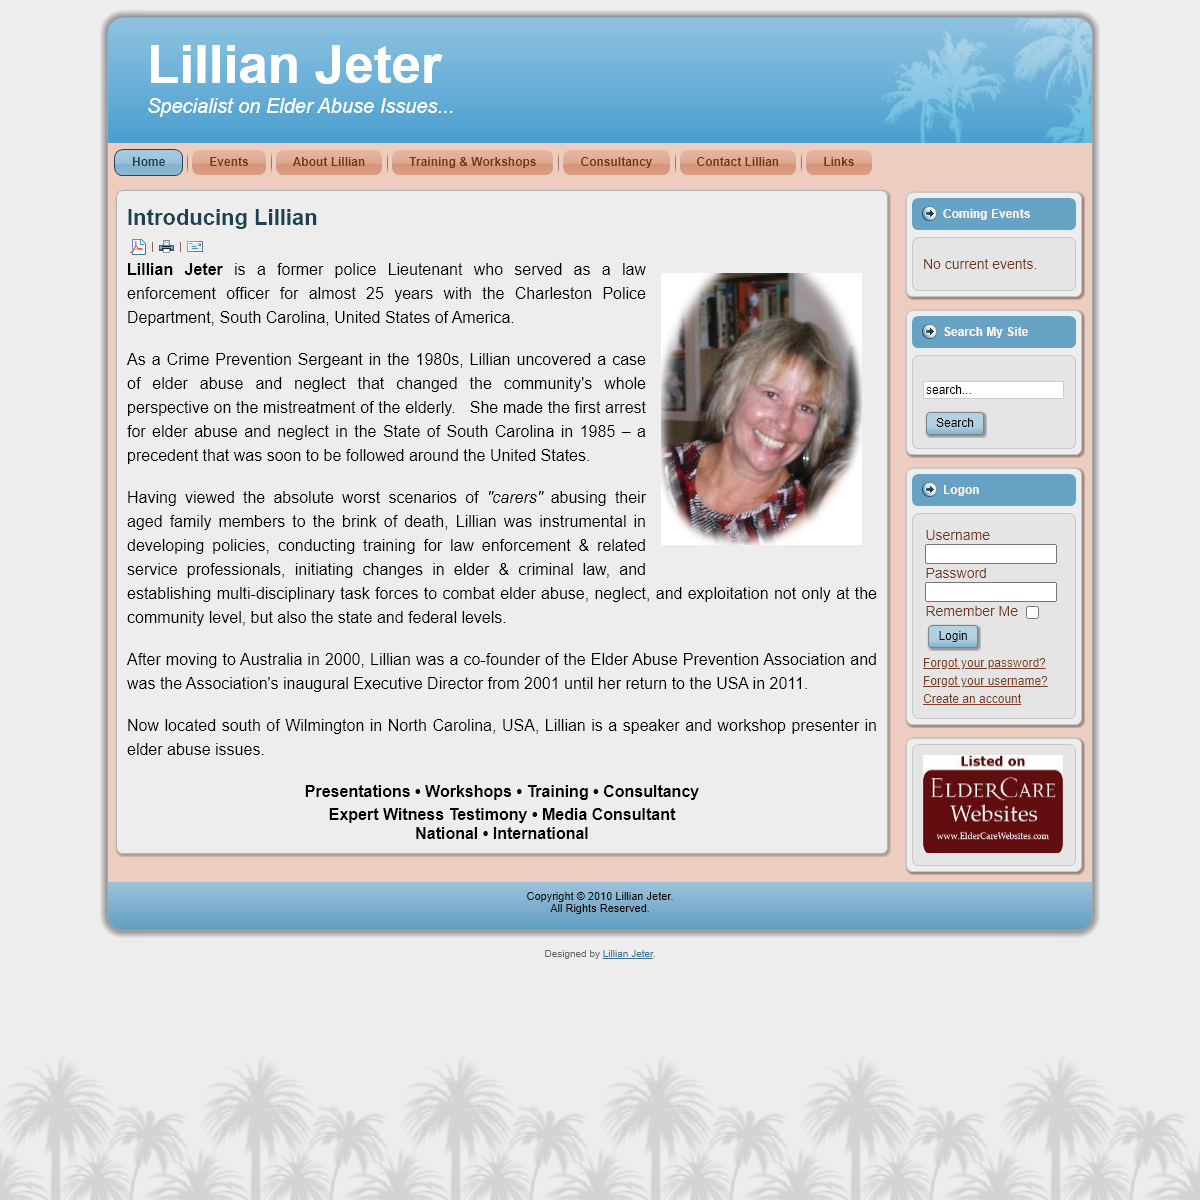 lillianjeter.com